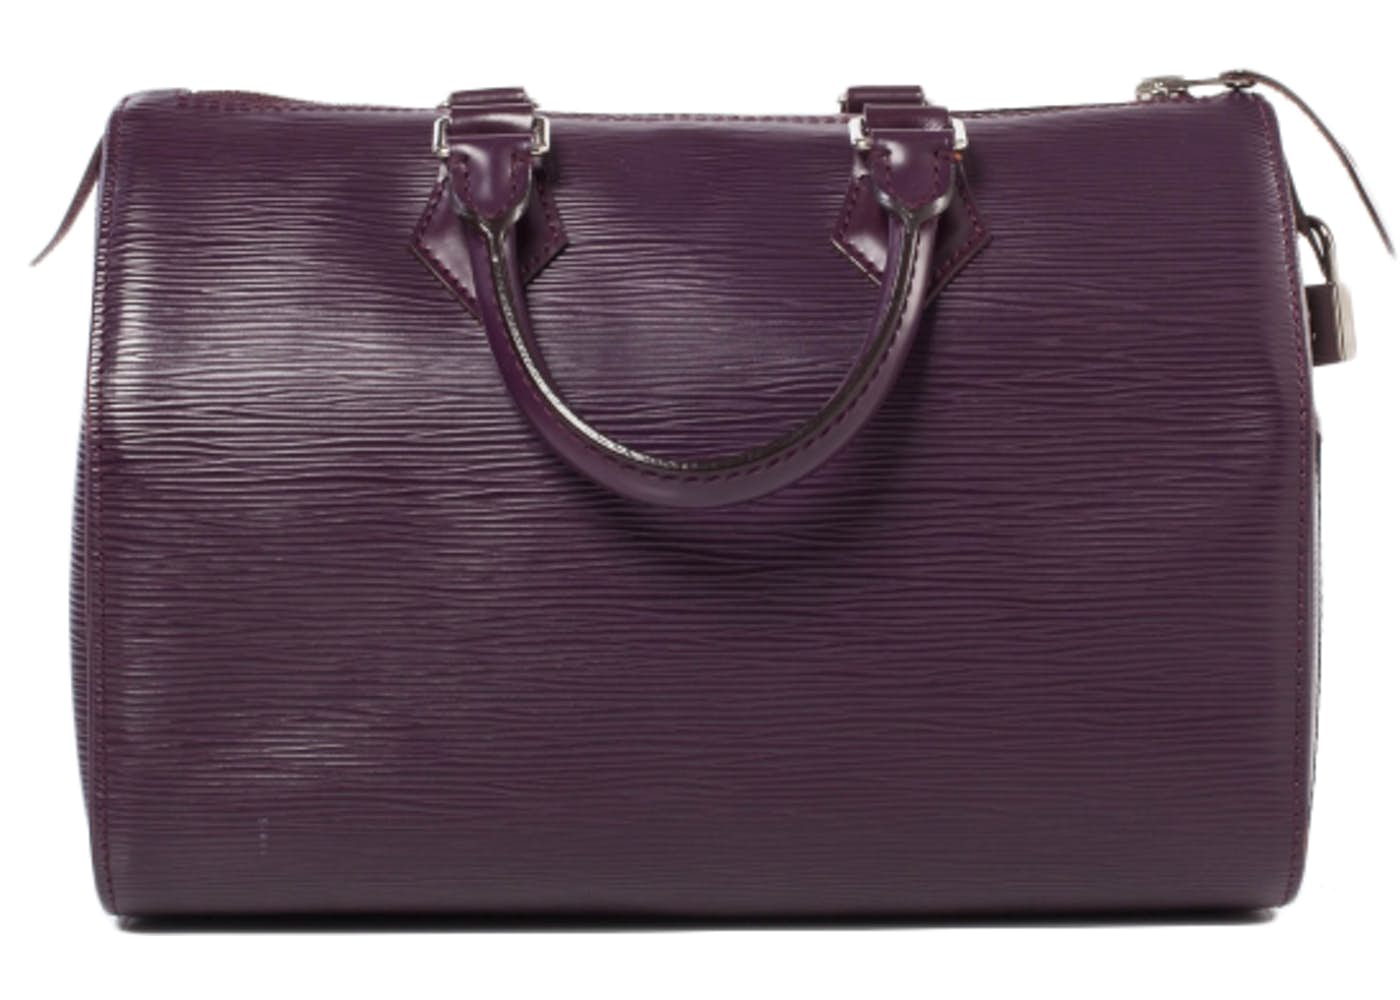 louis vuitton speedy epi 25 cassis purple. Black Bedroom Furniture Sets. Home Design Ideas